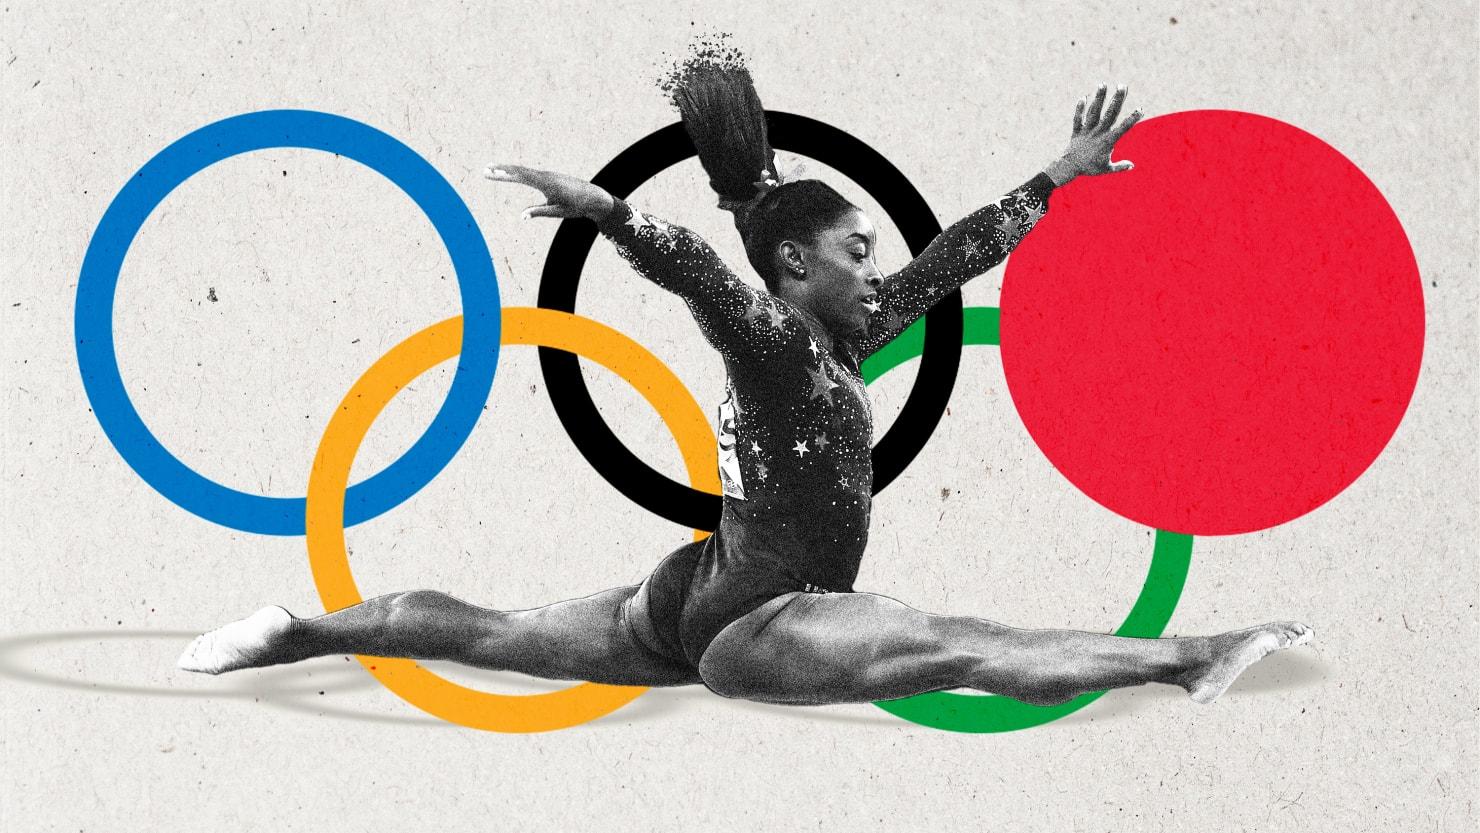 Olympic 'Purity' Pundits Slam Biles in Racist, Transphobic Media Tirade